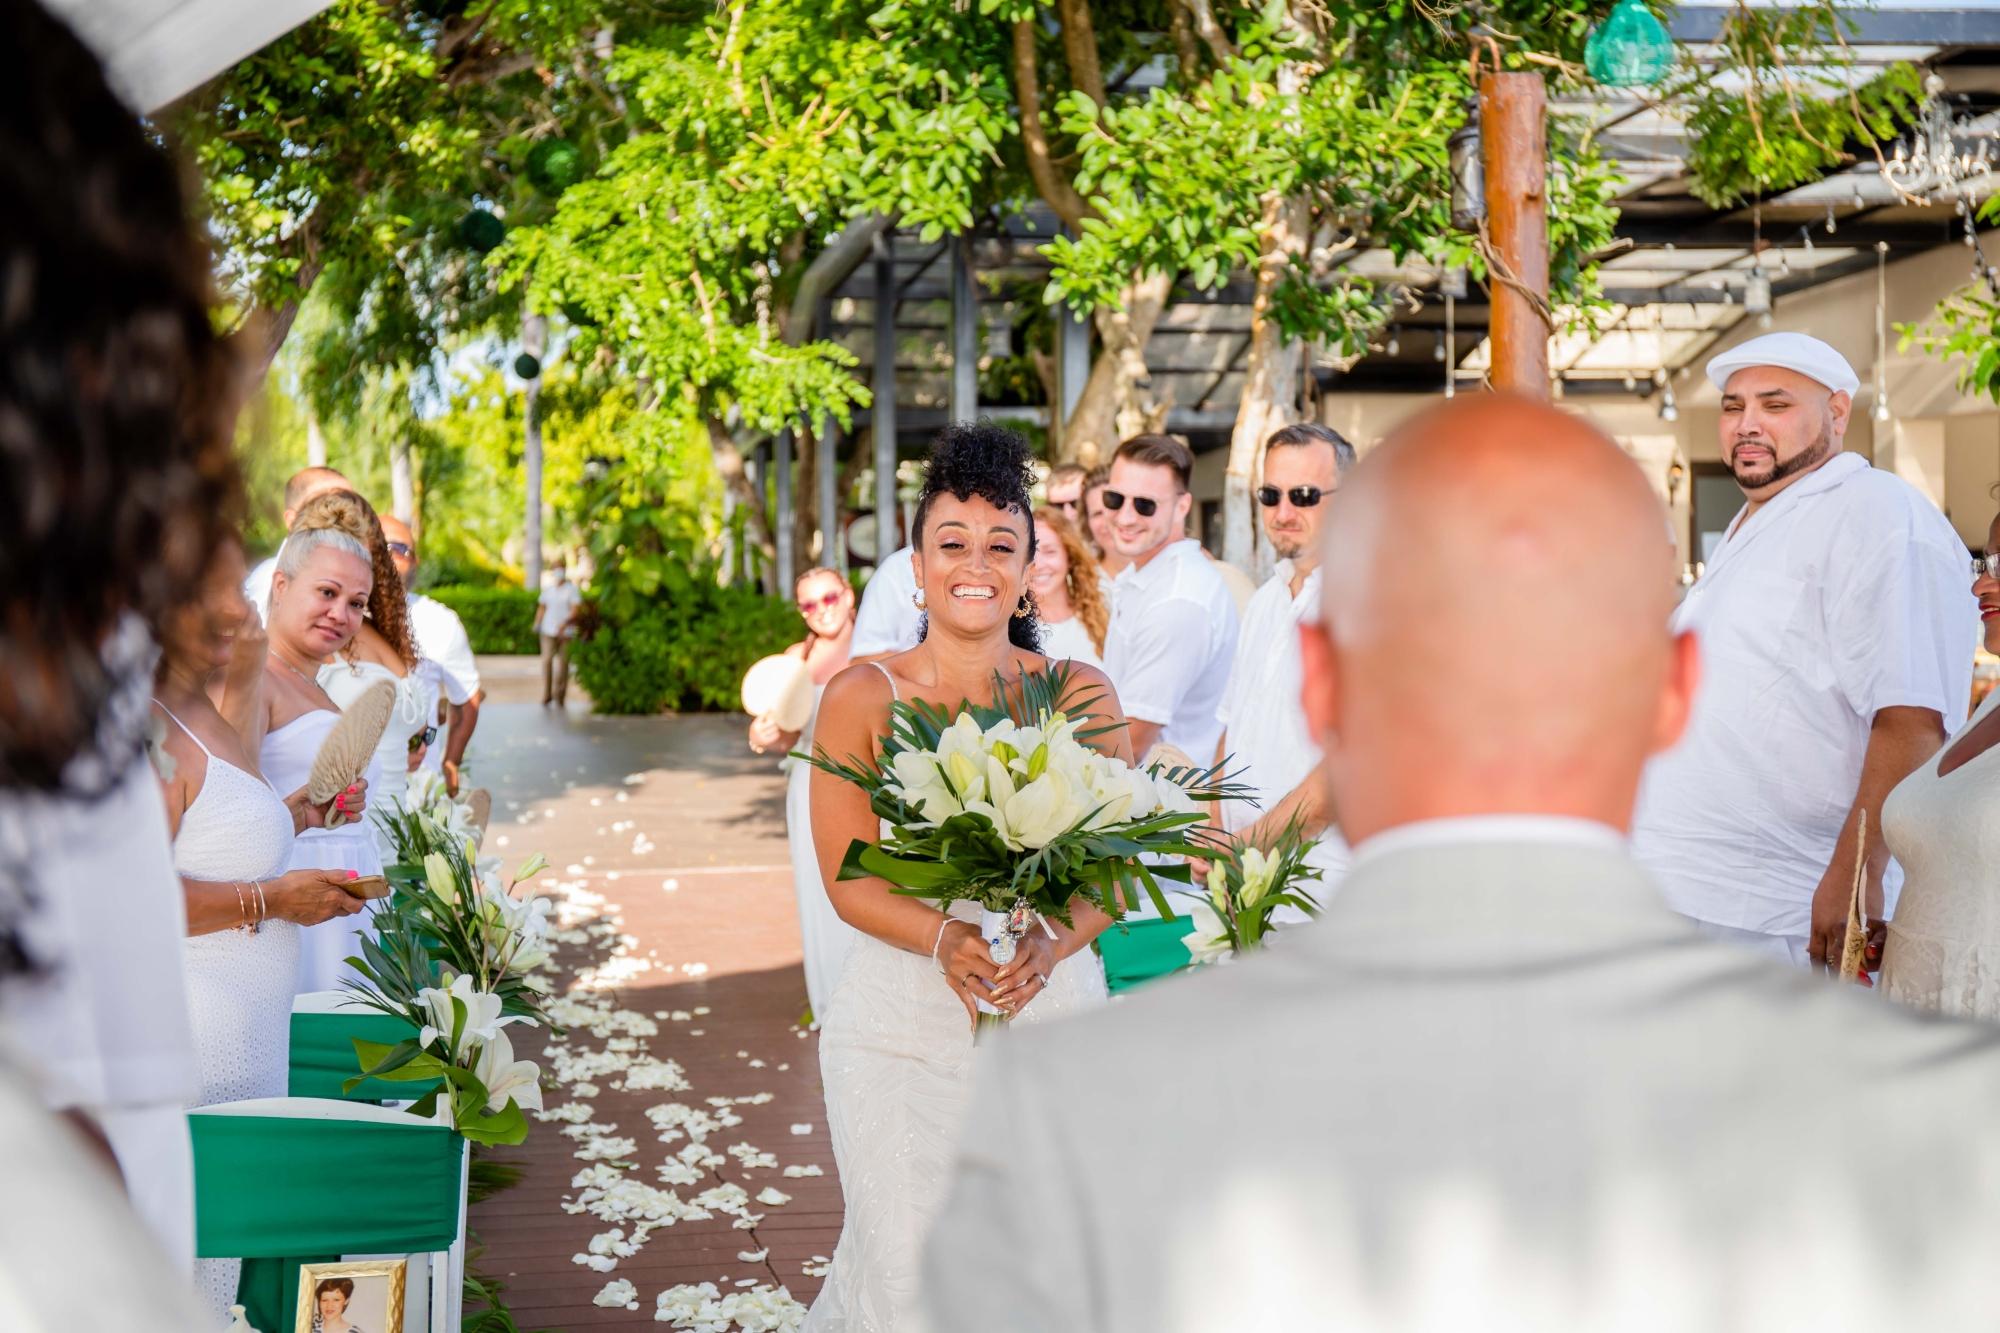 First look at a wedding at Secrets Aura